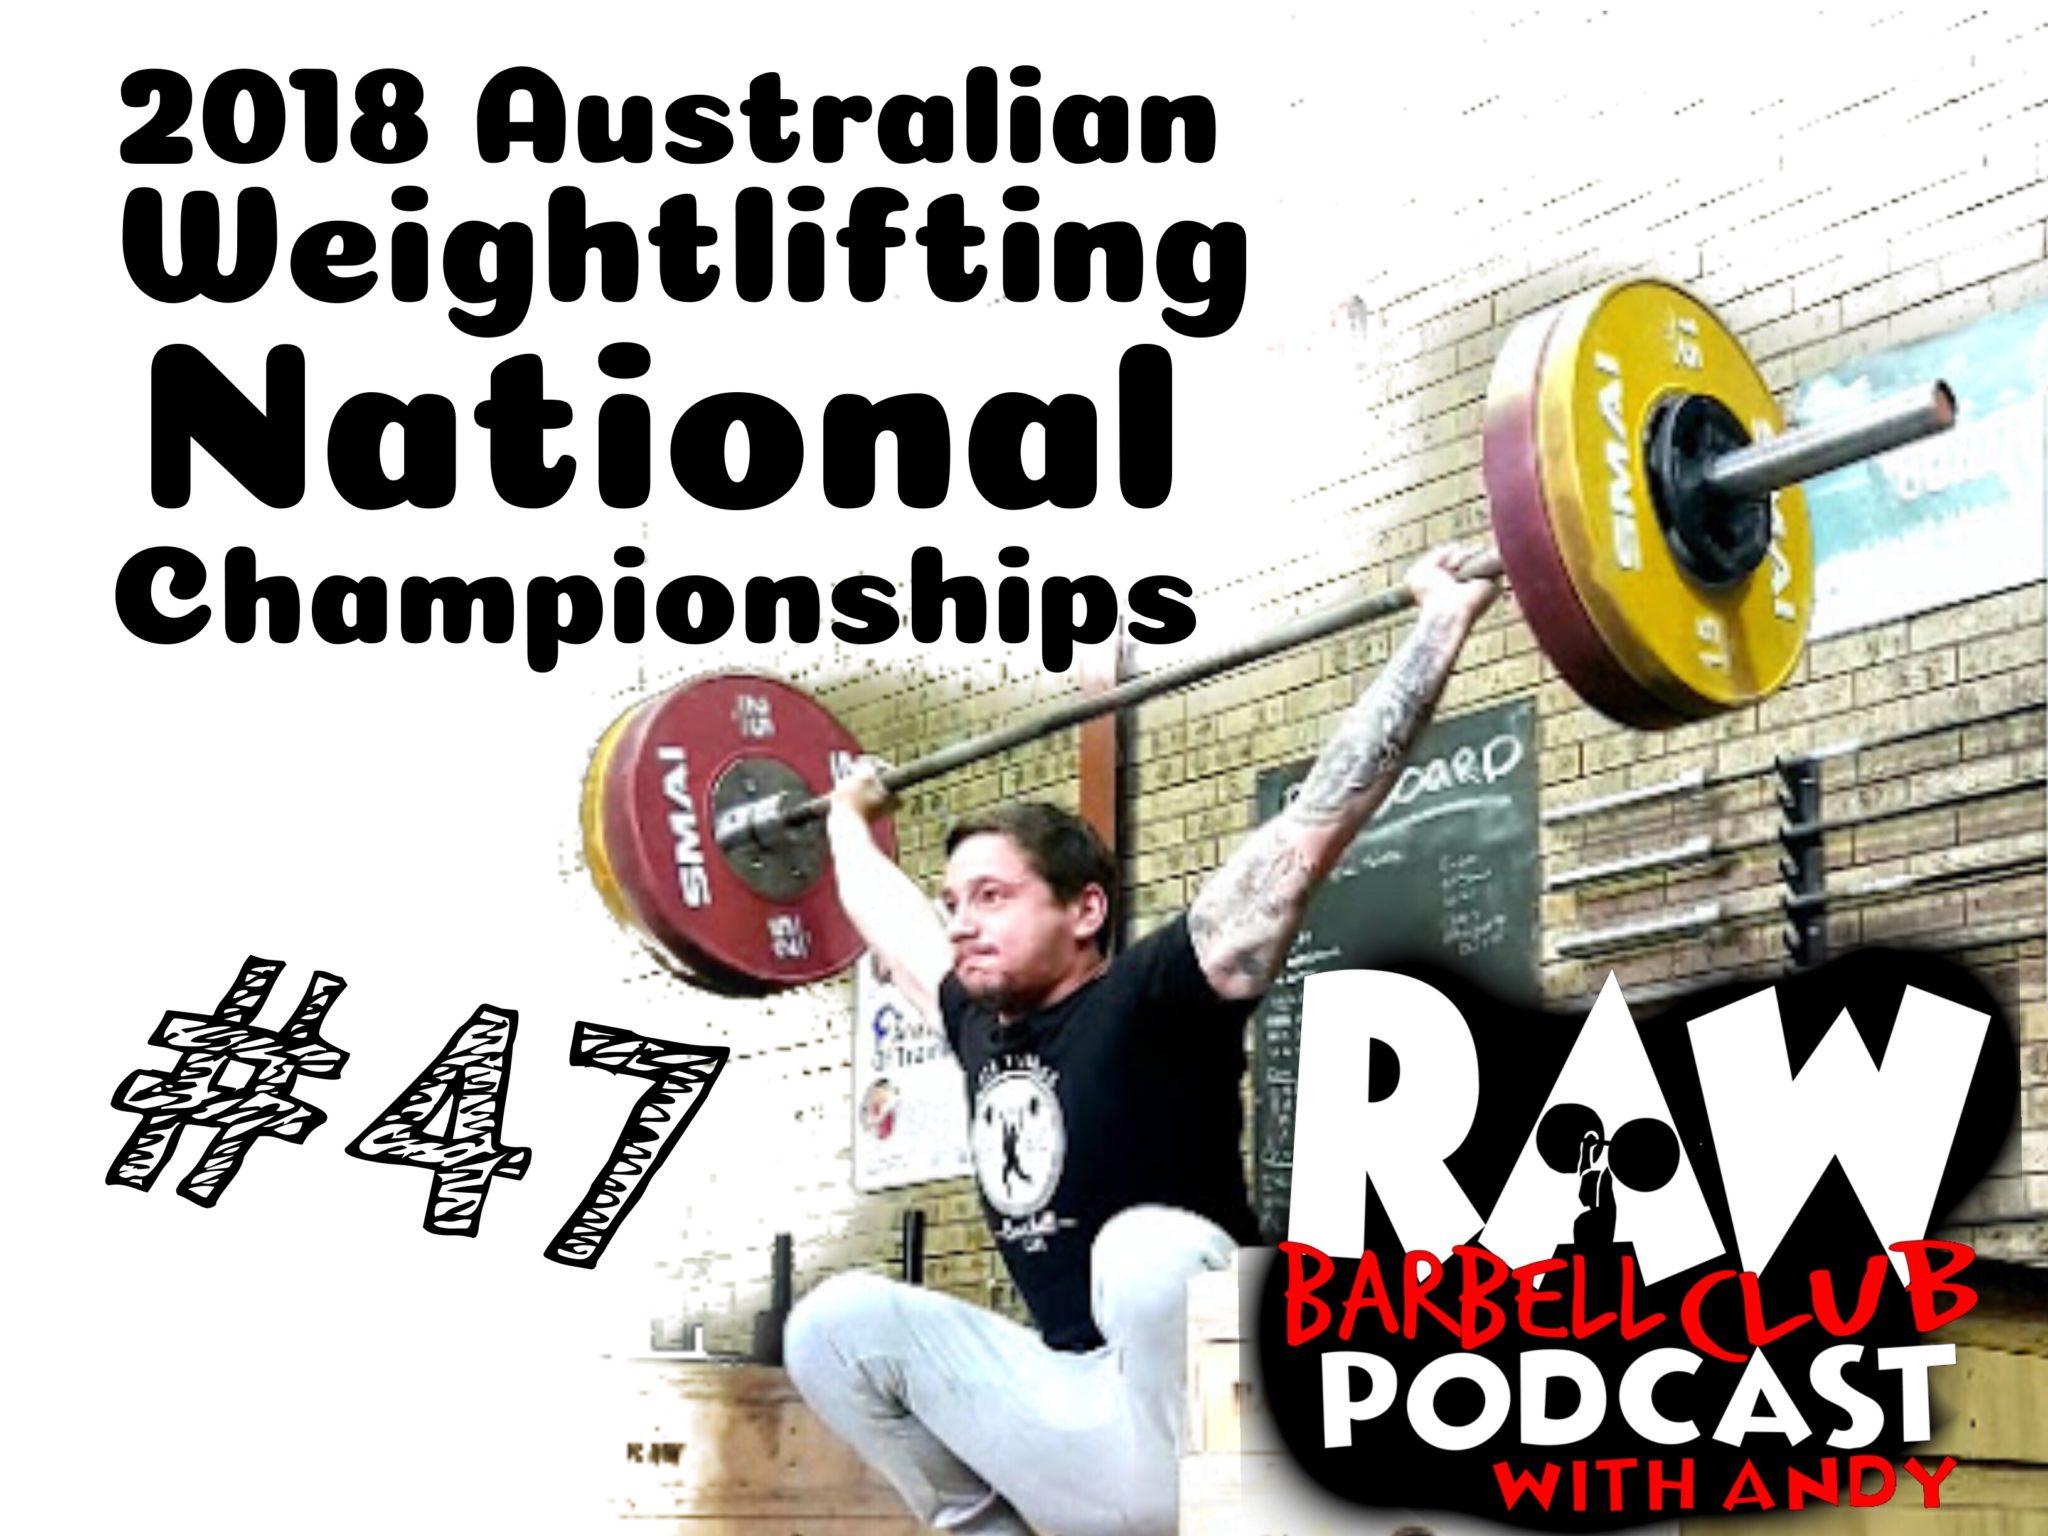 2018 Australian Senior Championships Predictions with Yannick Mifsud